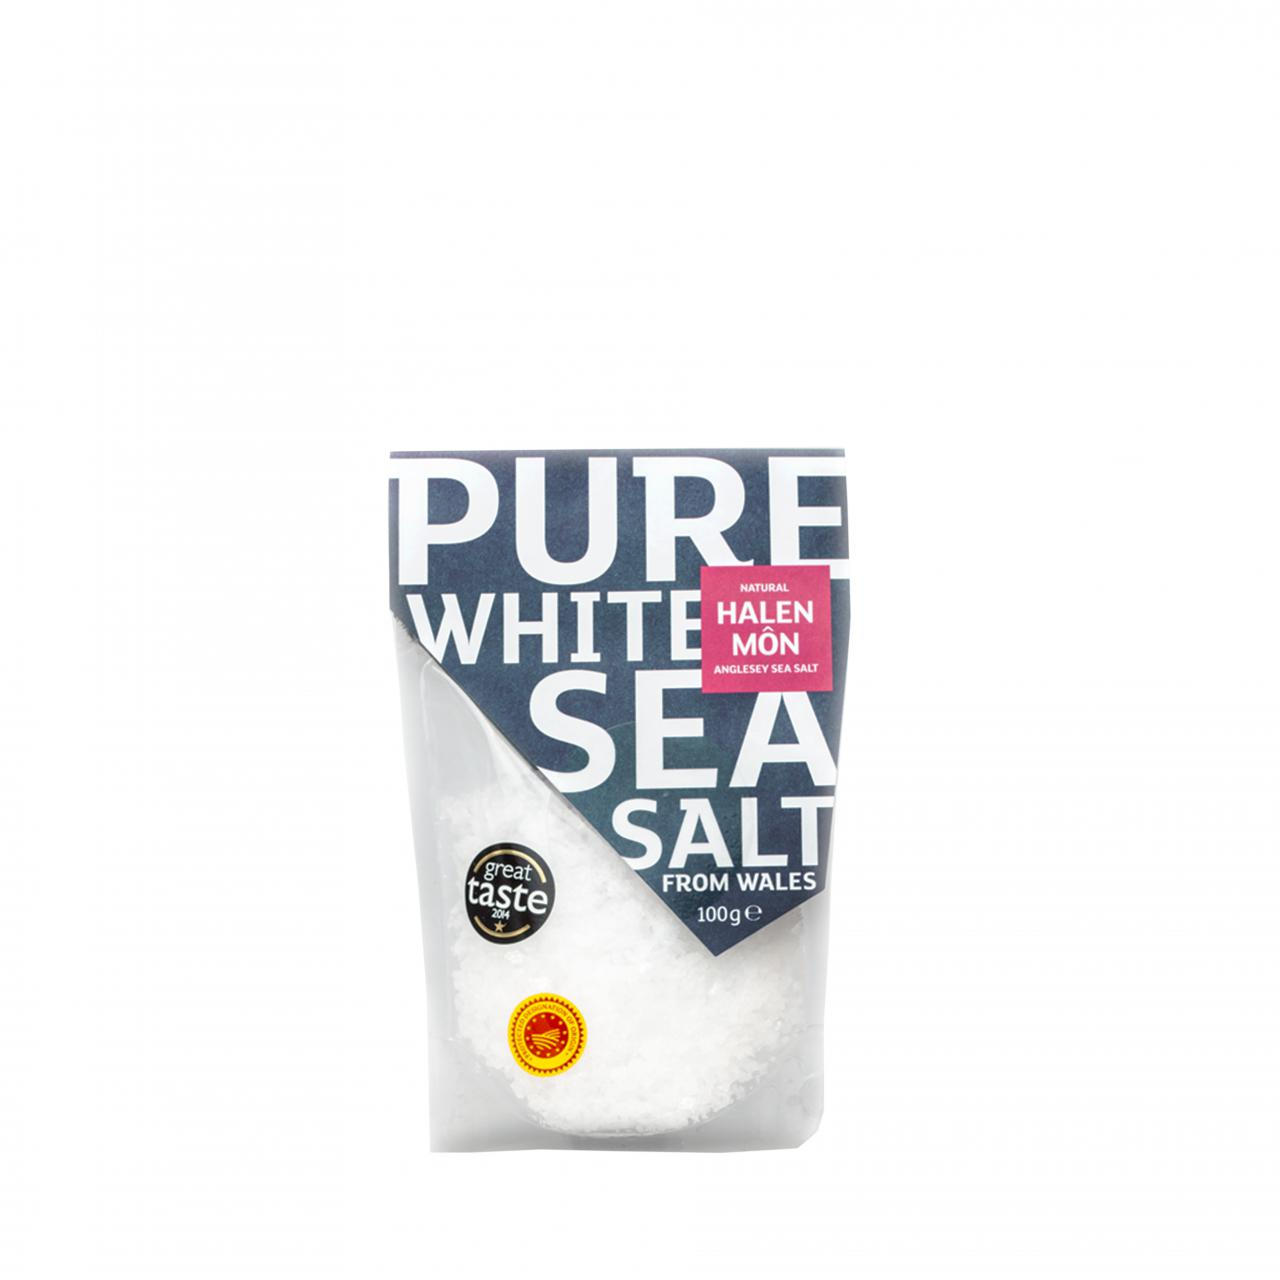 Pure White Sea Salt (100g)